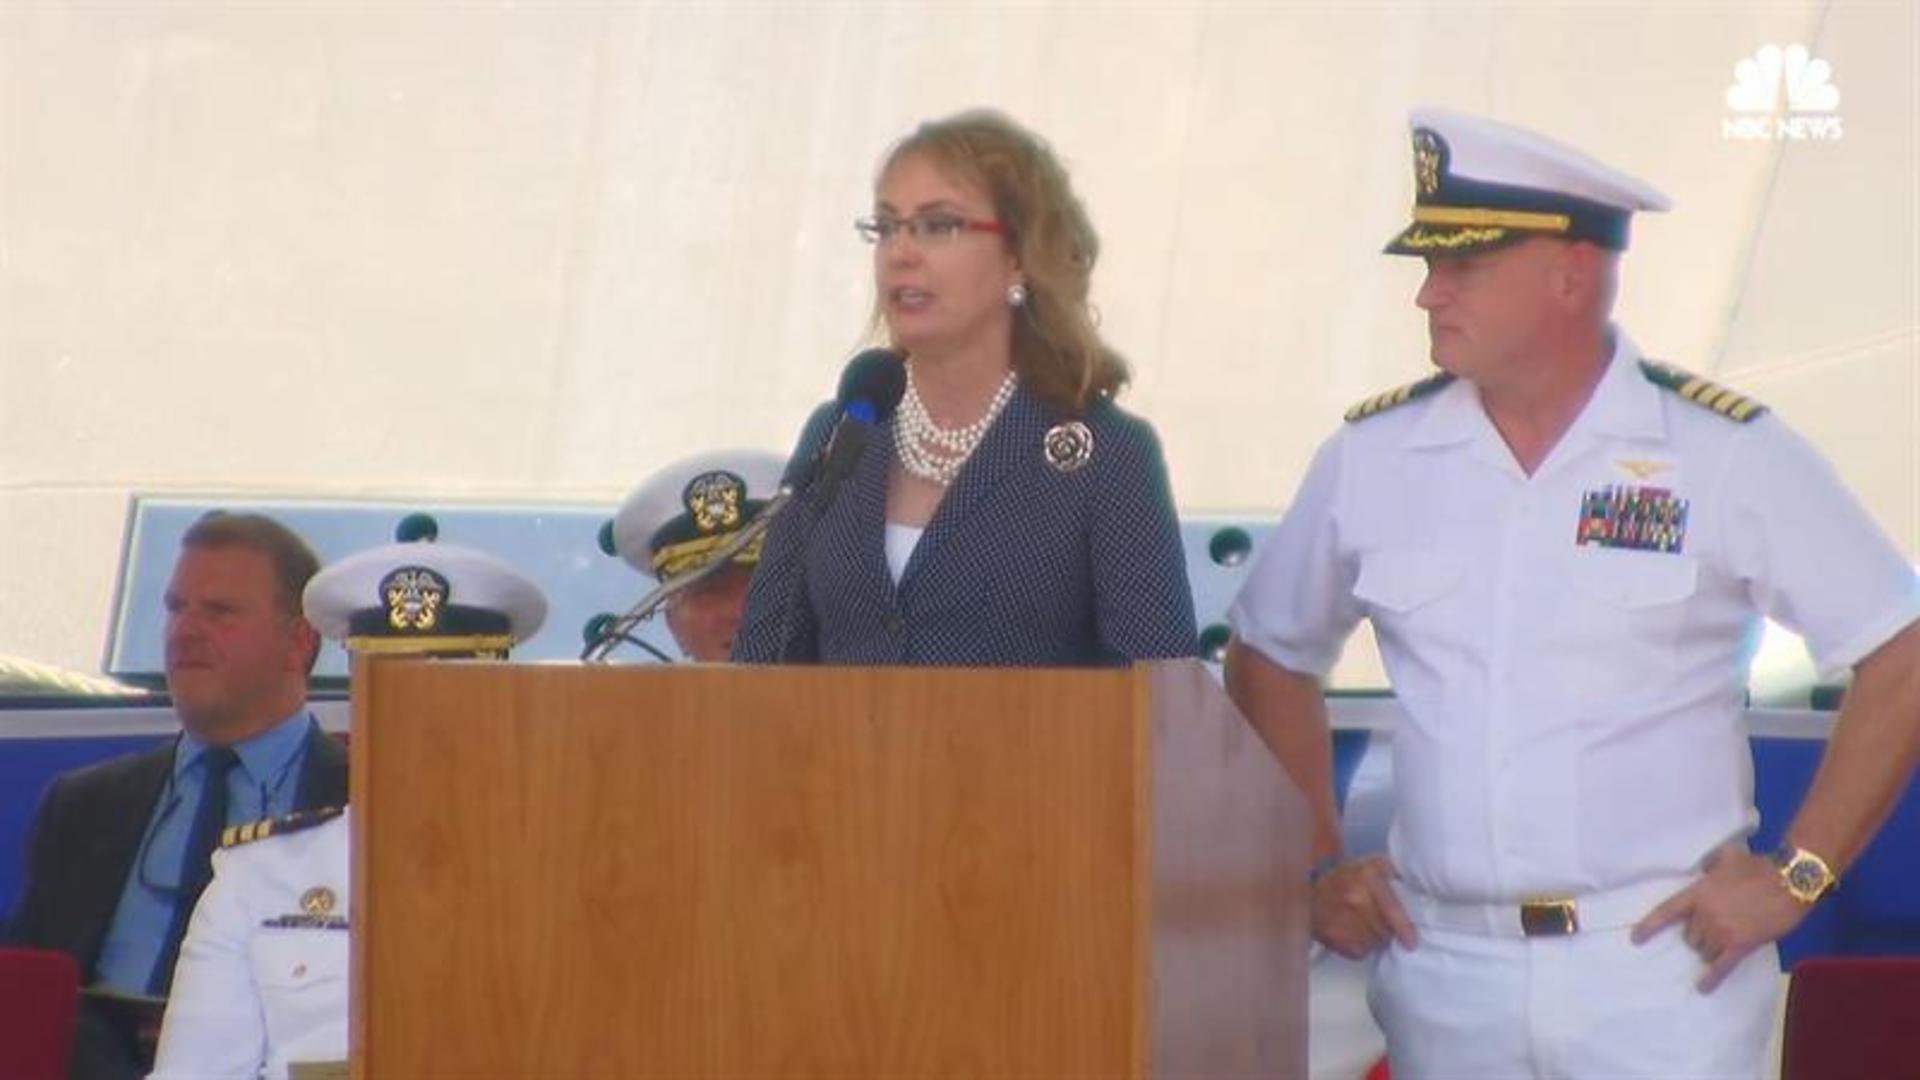 Navy Ship Named For Gun Violence Survivor Gabrielle Giffords Commissioned